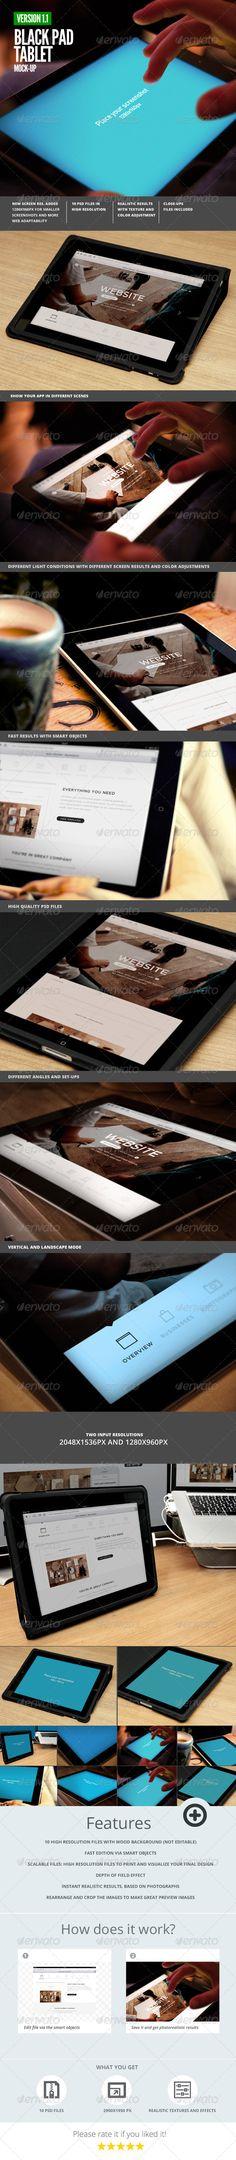 Black Pad | Tablet App UI Mock-Up Download here: https://graphicriver.net/item/black-pad-tablet-app-ui-mockup/3374437?ref=KlitVogli